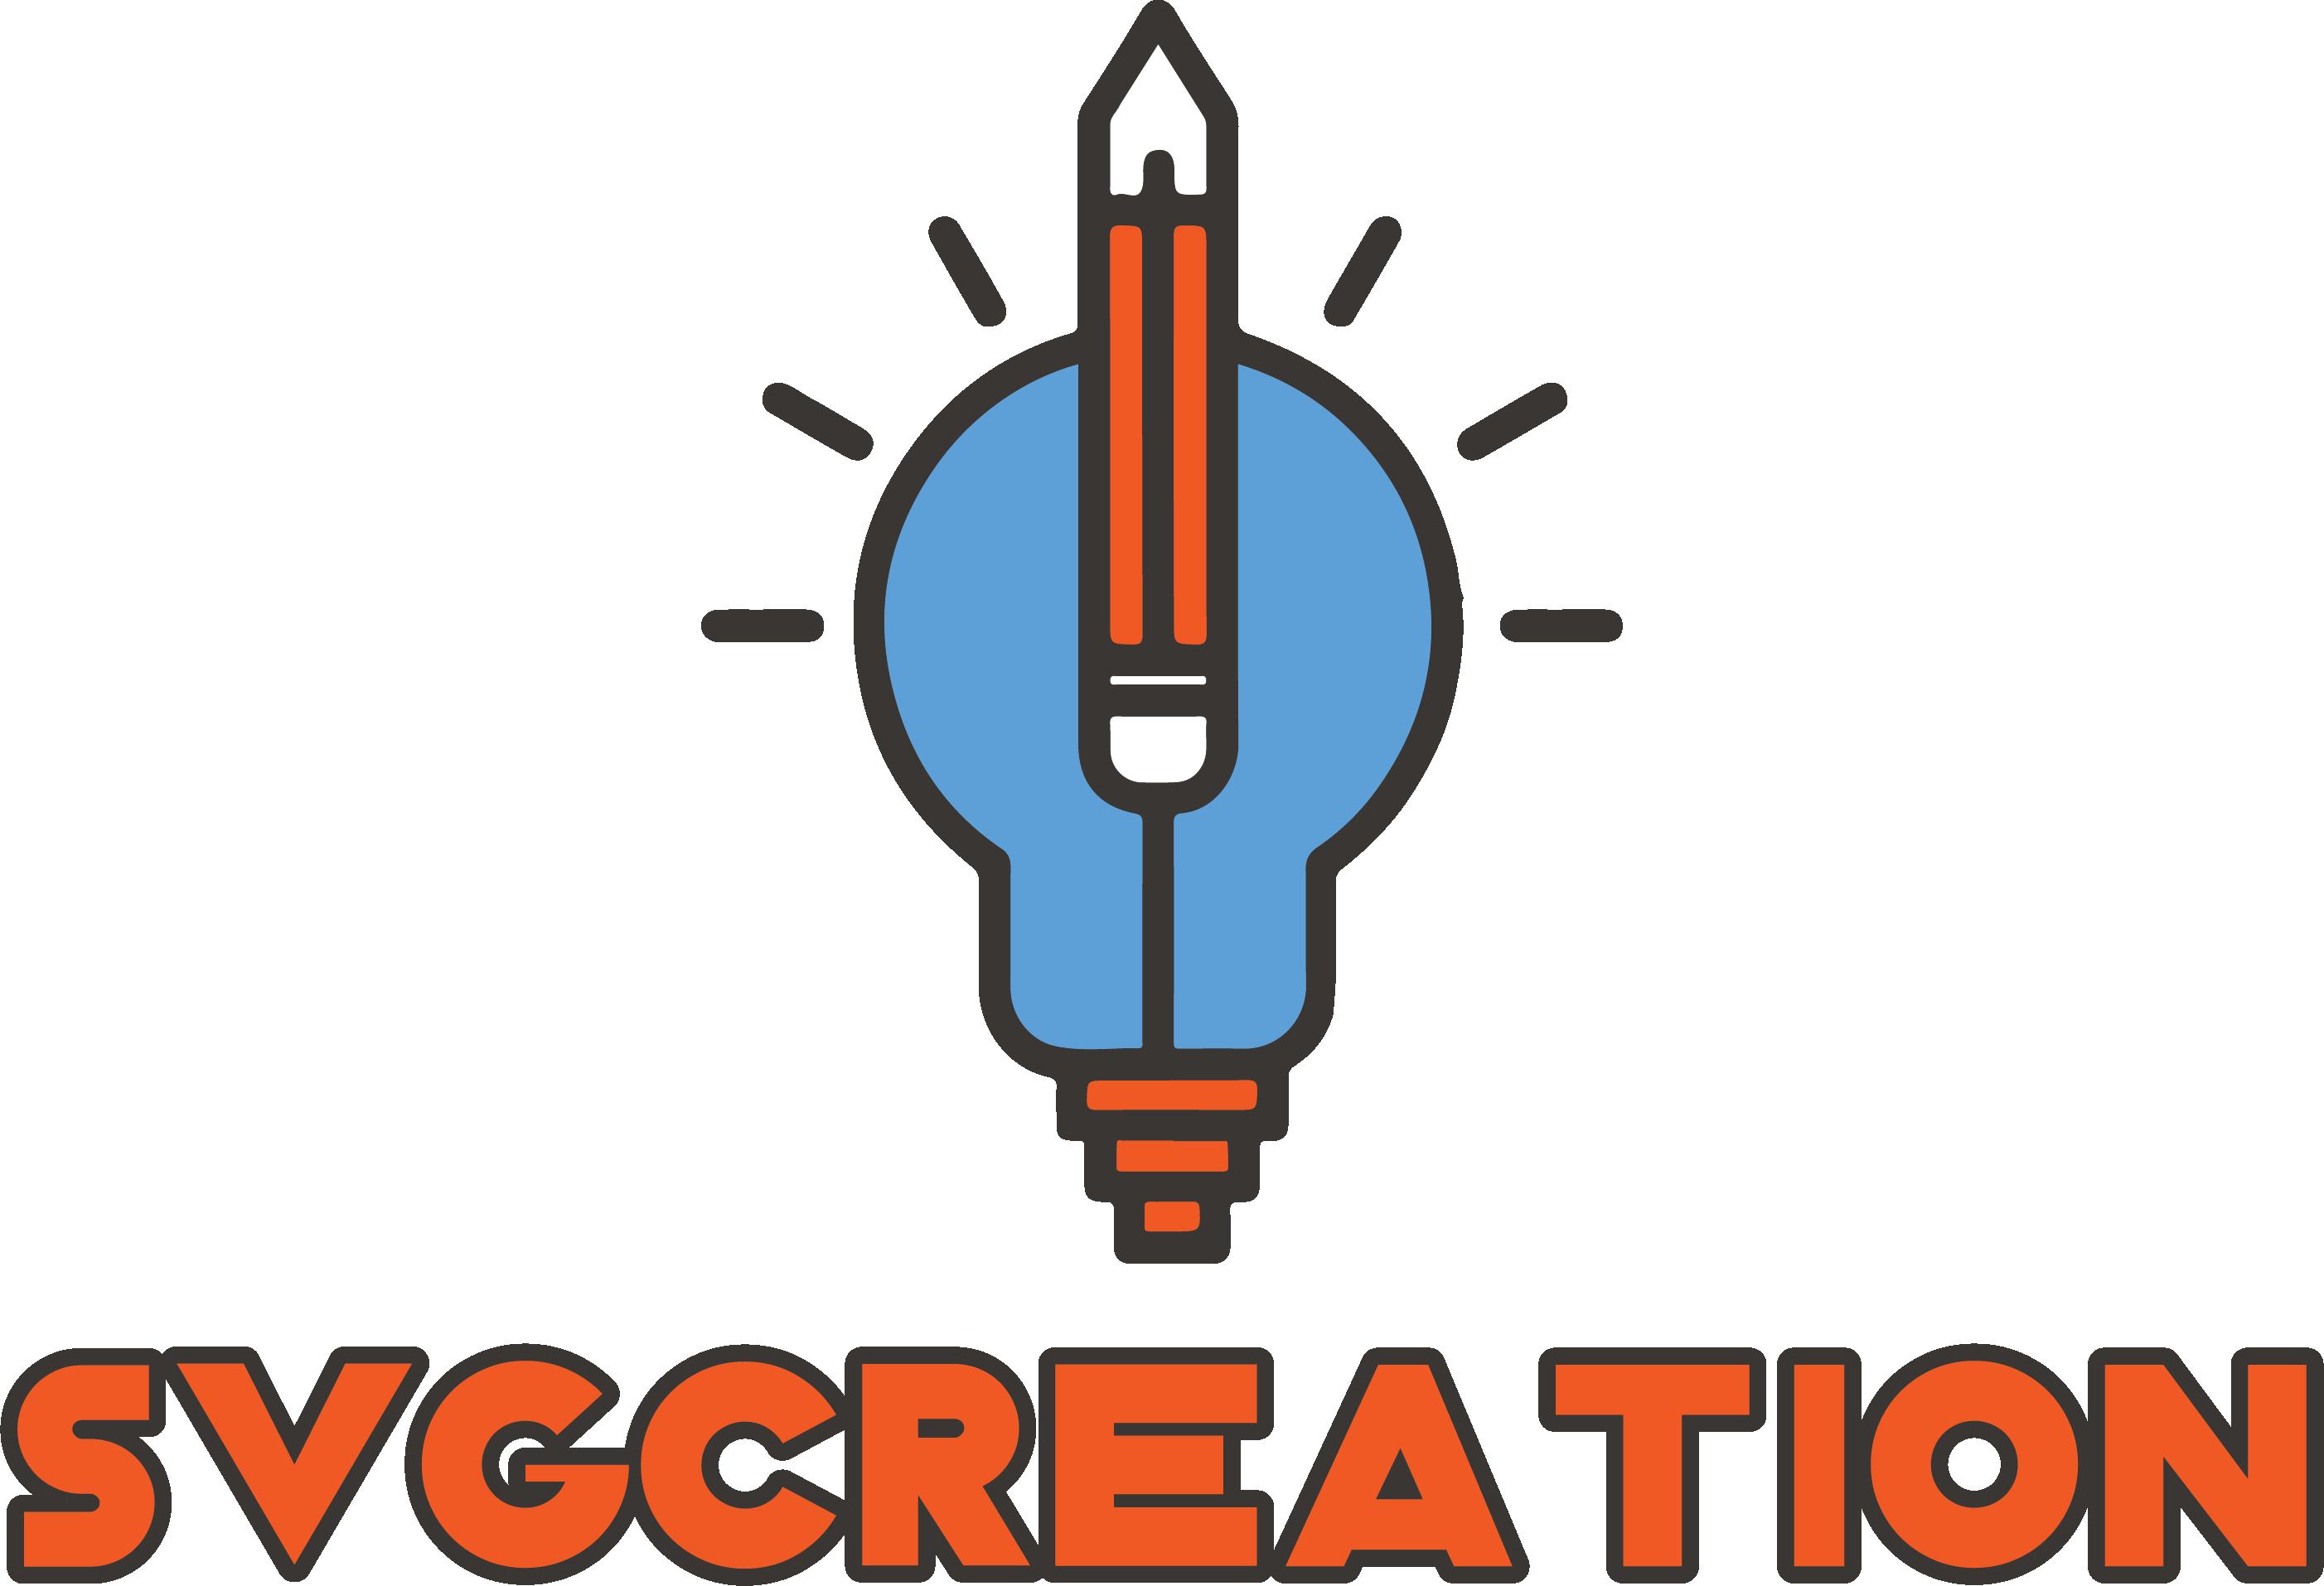 SVGCreation